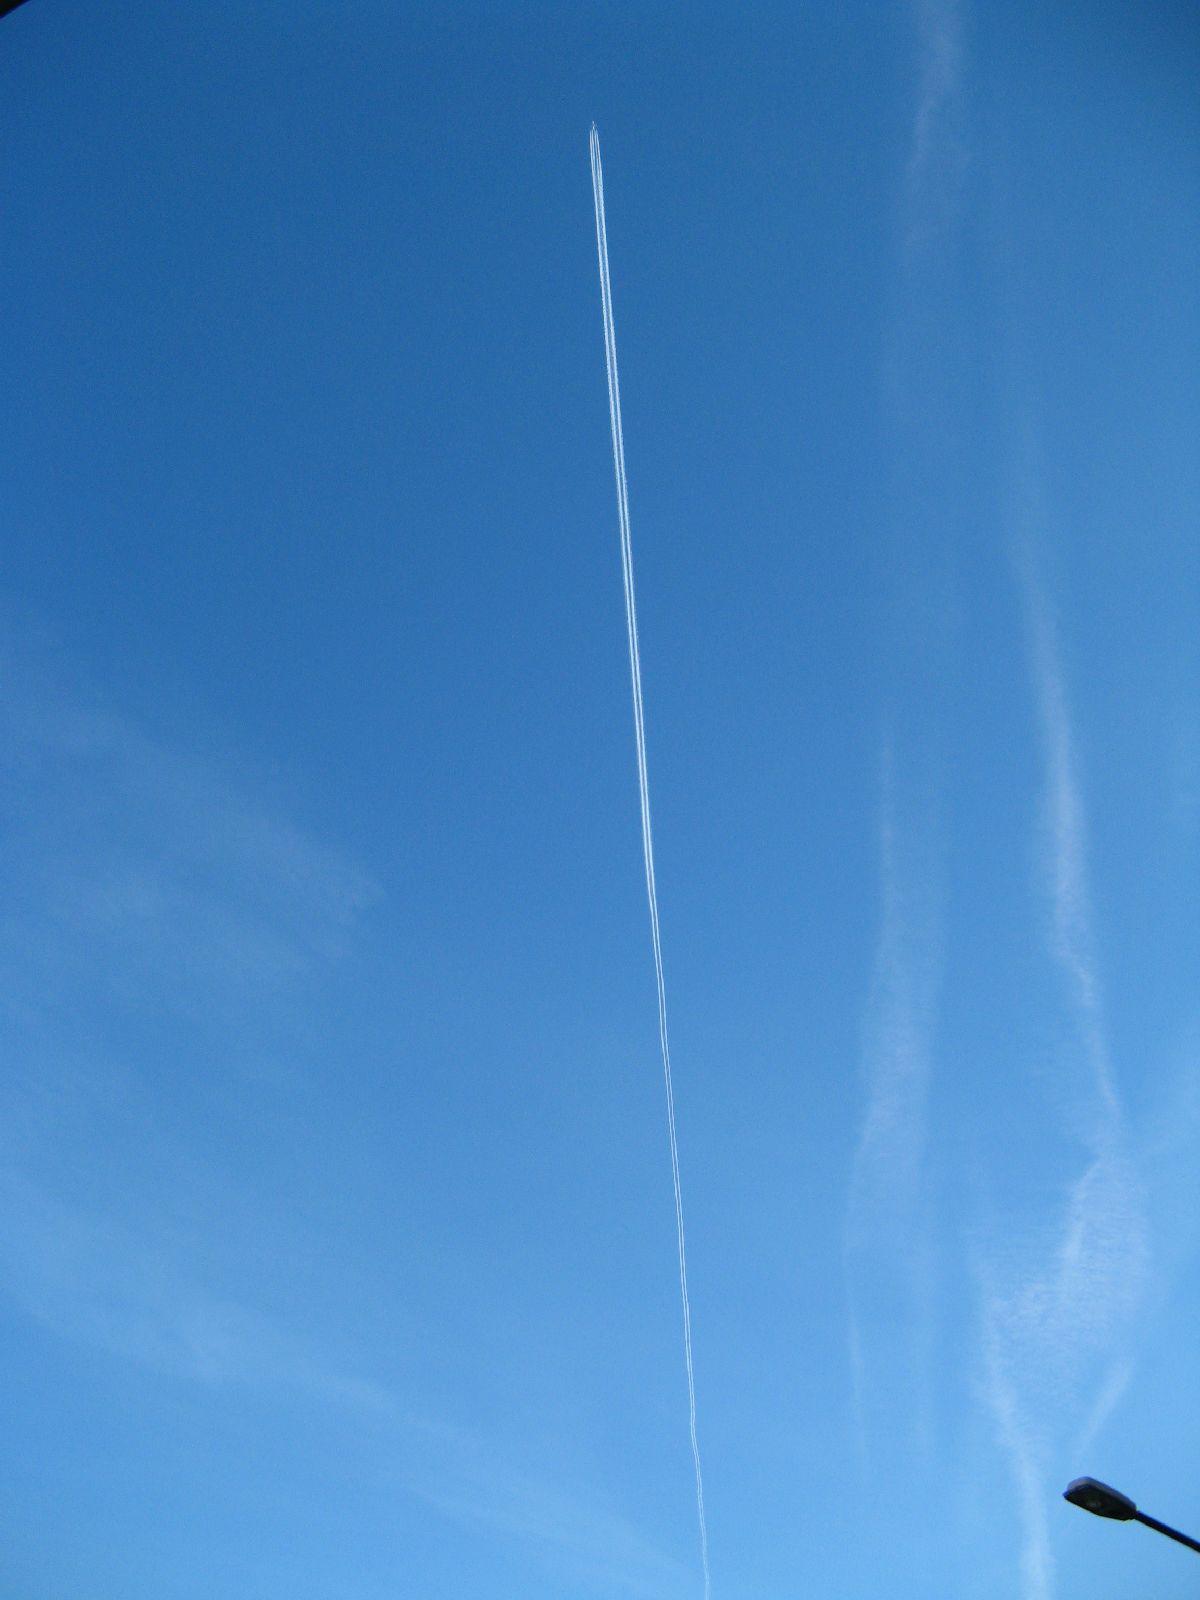 Himmel-Wolken-Foto_Textur_B_5063